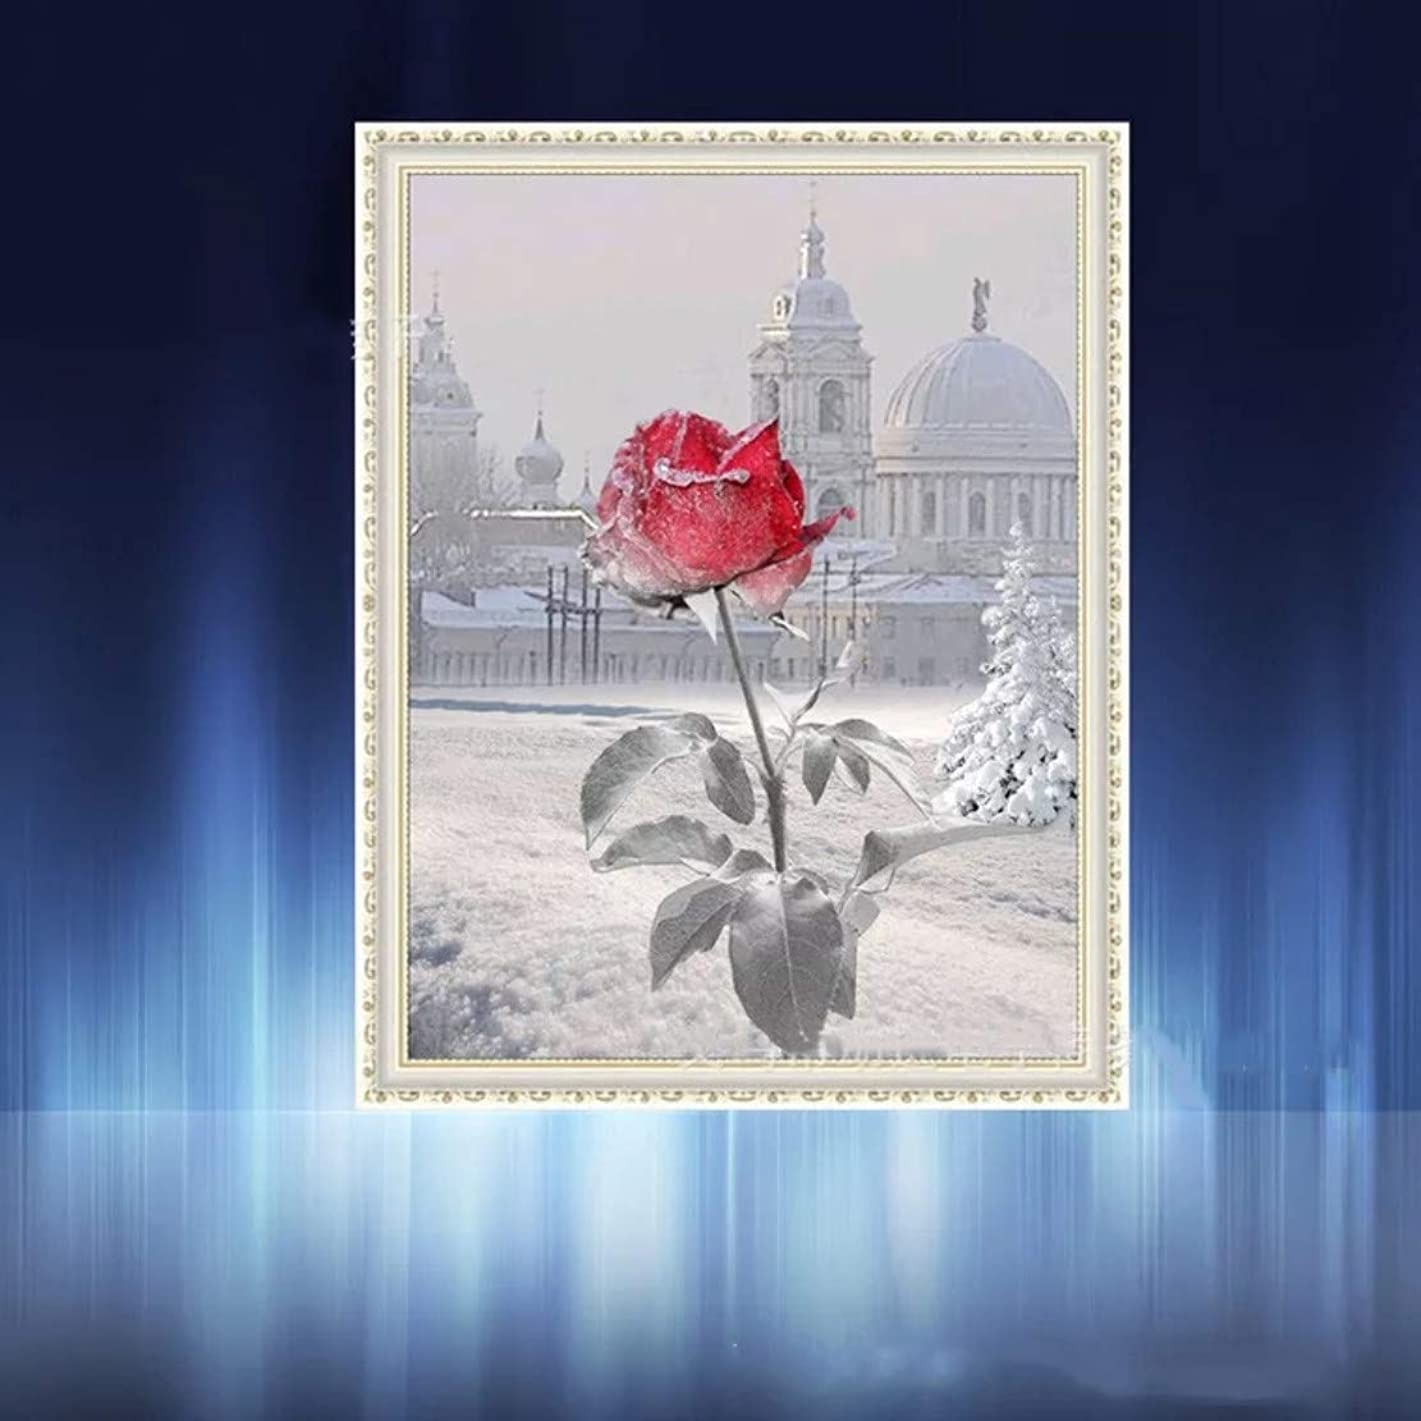 DIY 5D Diamond Painting Kit Full Diamond Rose Embroidery Square Resinstone Cross Stitch Arts Craft Supply for Home Wall Decori1j